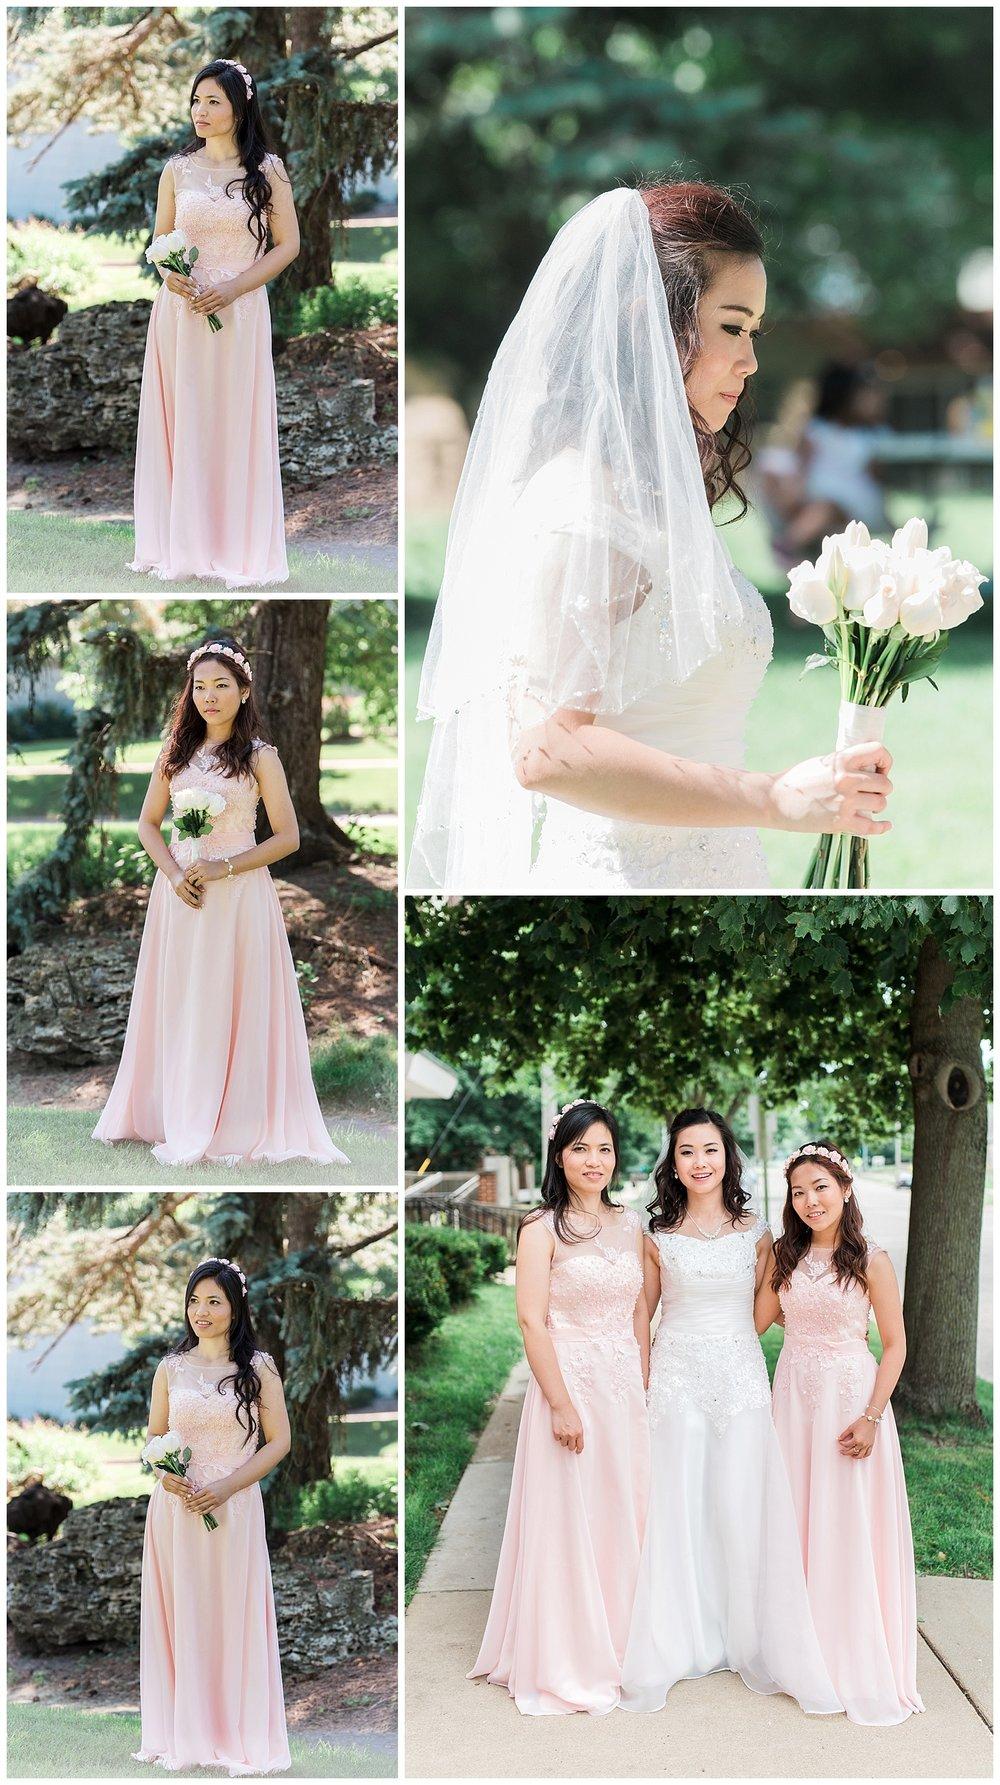 Burmese Wedding Nicole Corrine Iowa Wedding Photographer 22.jpg